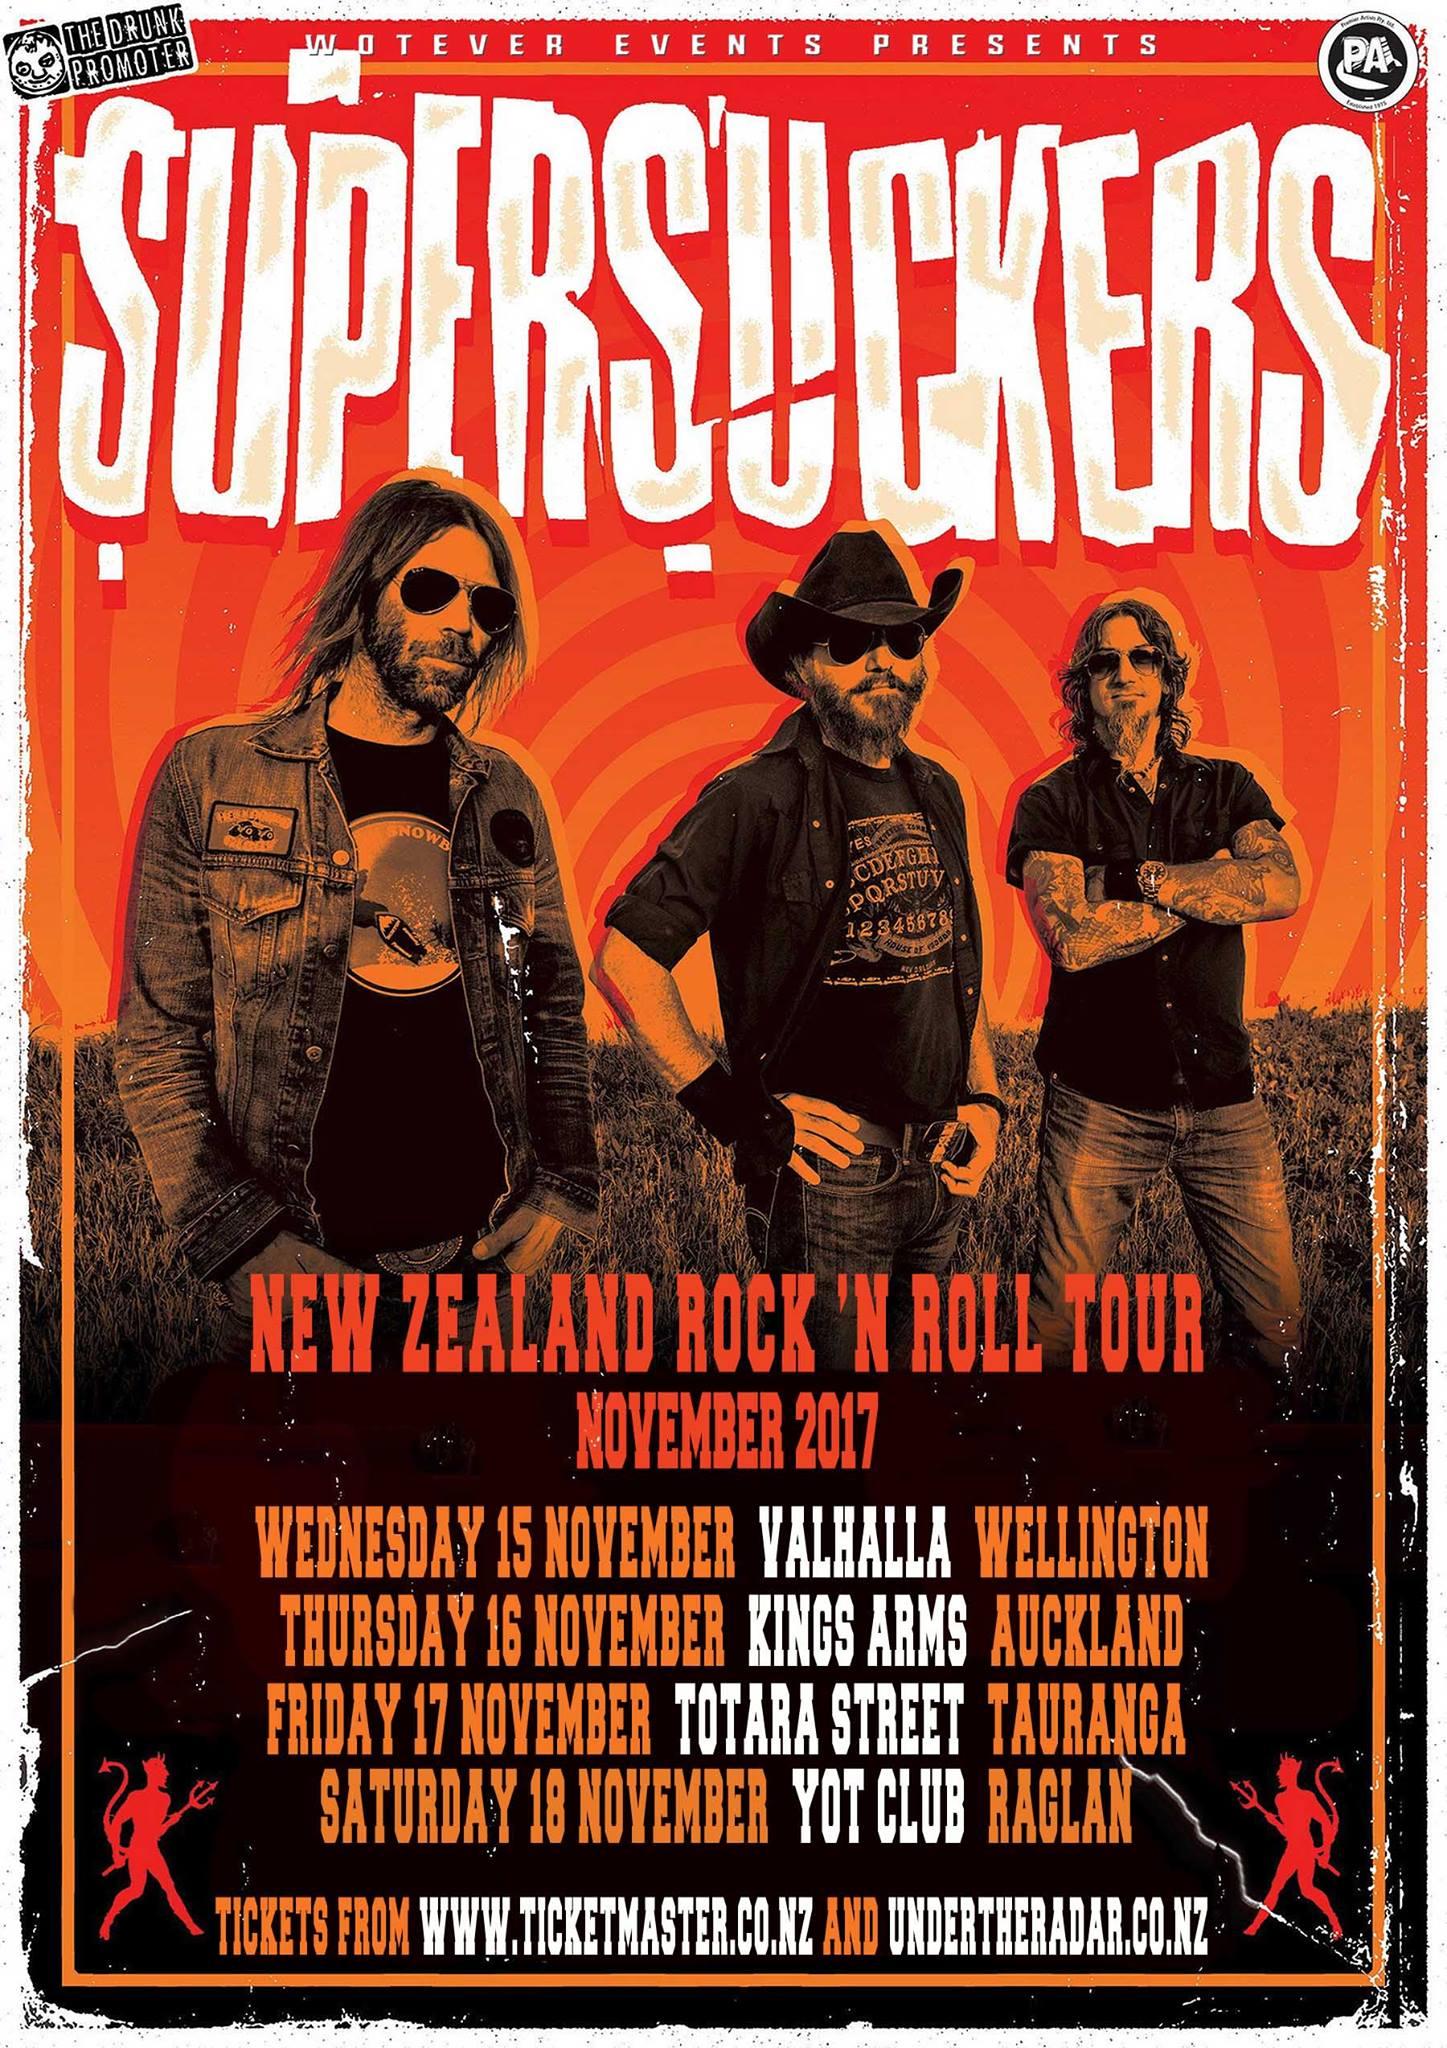 Supersuckers NZ Tour Poster